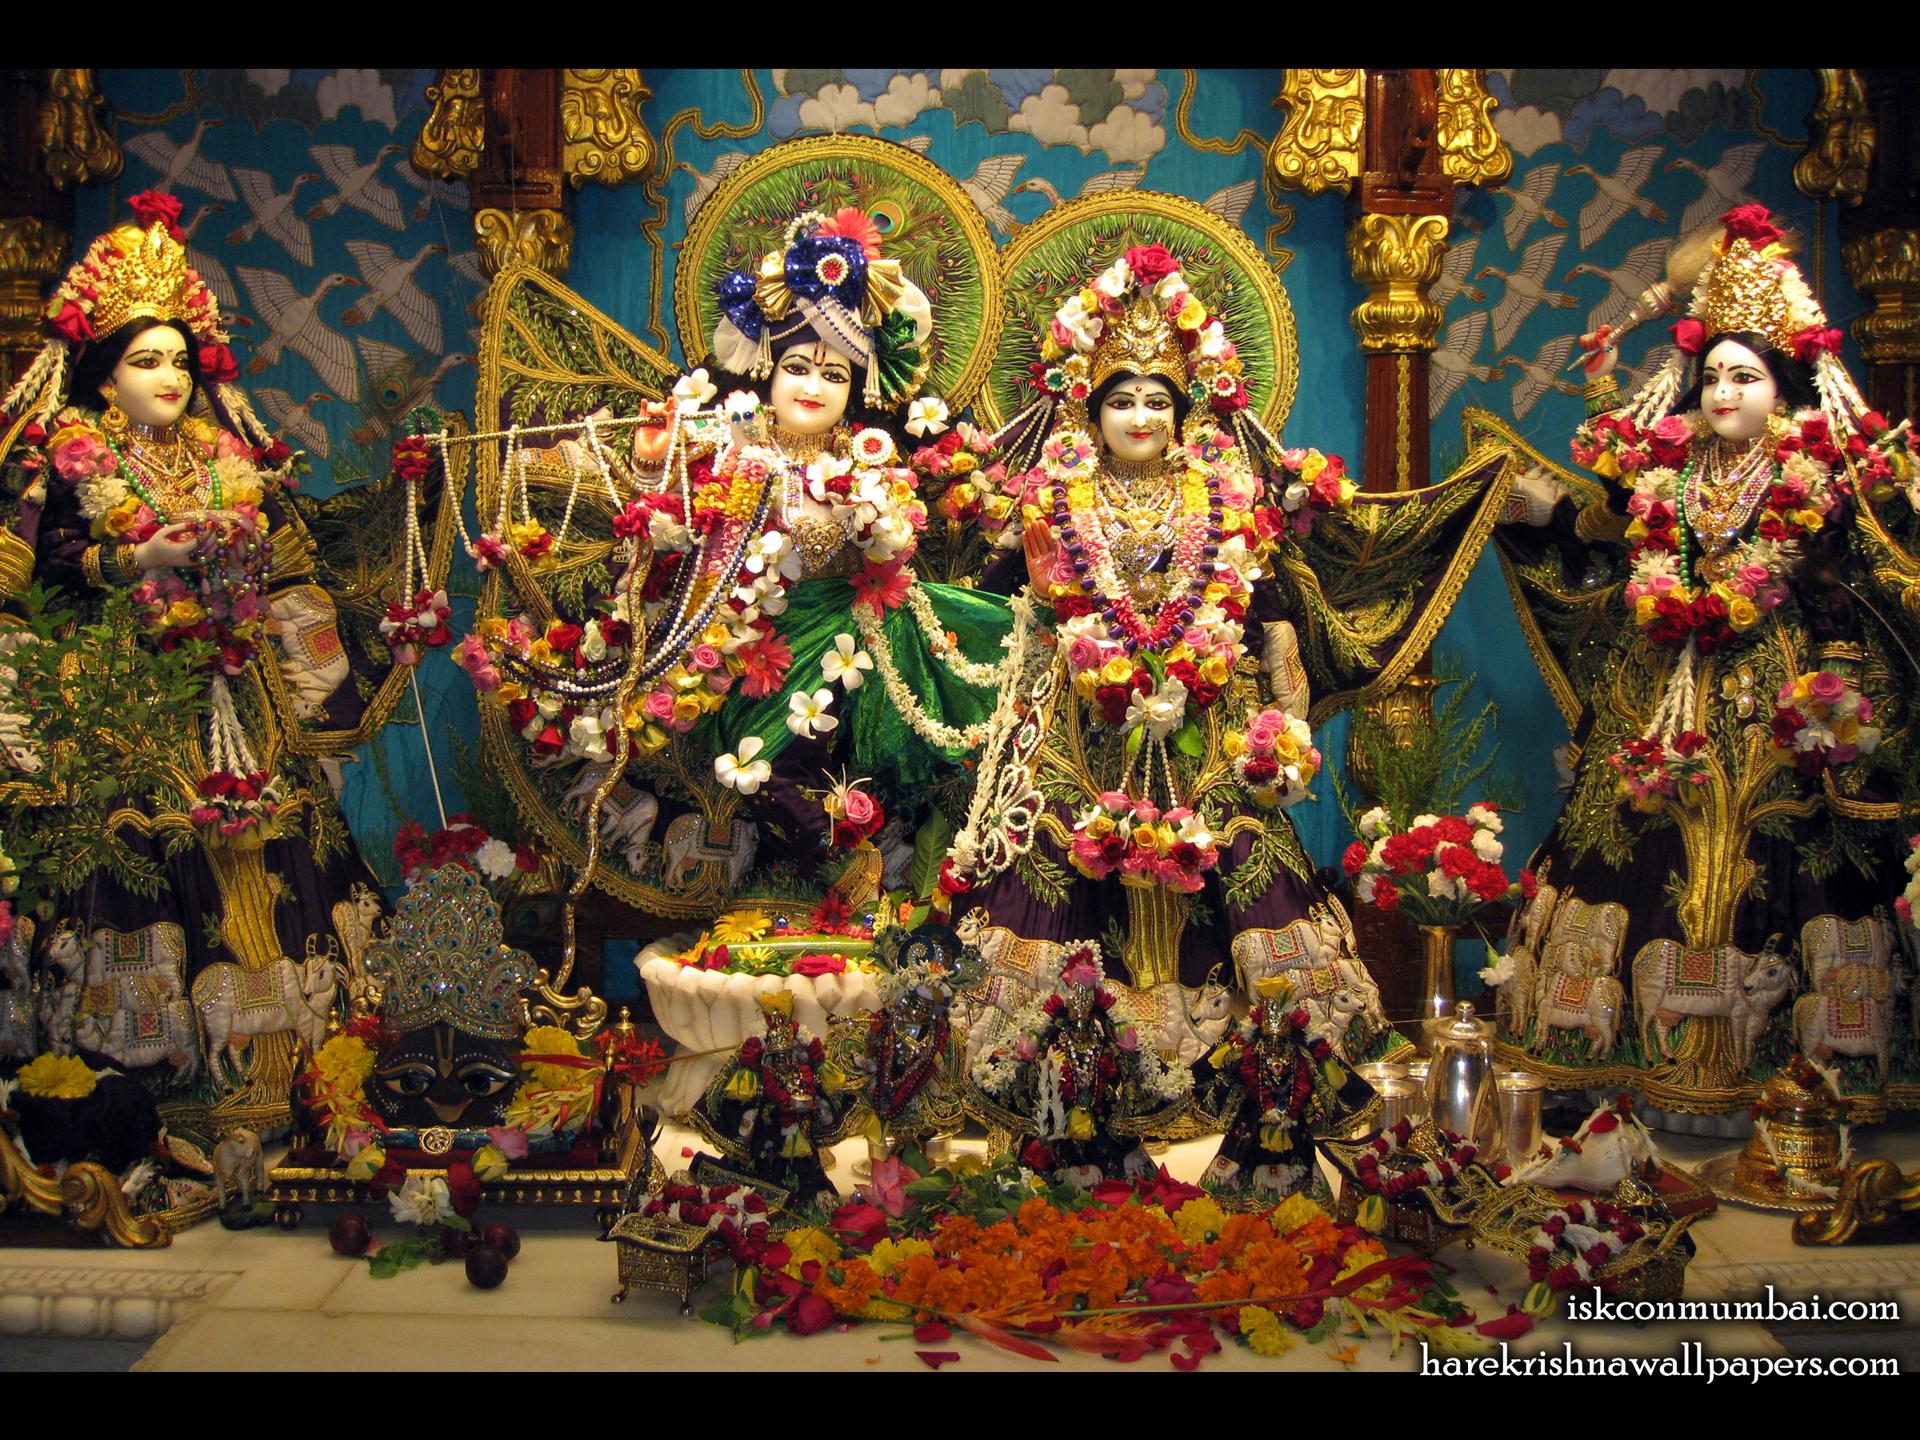 Sri Sri Radha Rasabihari Lalita Vishakha Wallpaper (002) Size 1920x1440 Download